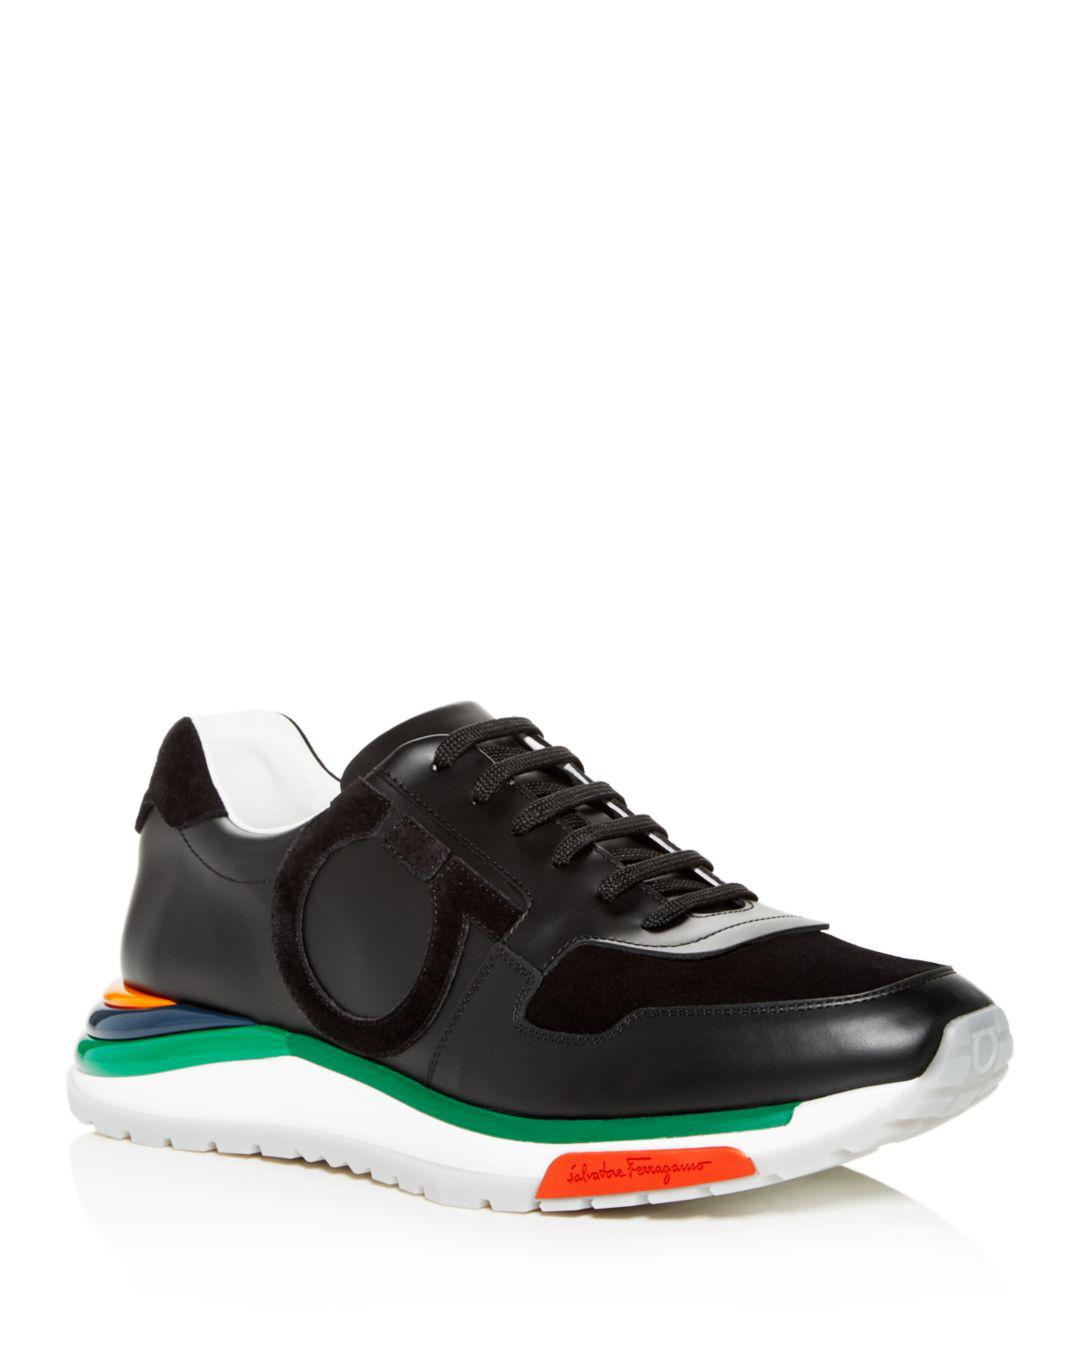 c808e2e277b Lyst - Ferragamo Men s Brooklyn Sneakers W  Rainbow Sole in Black ...